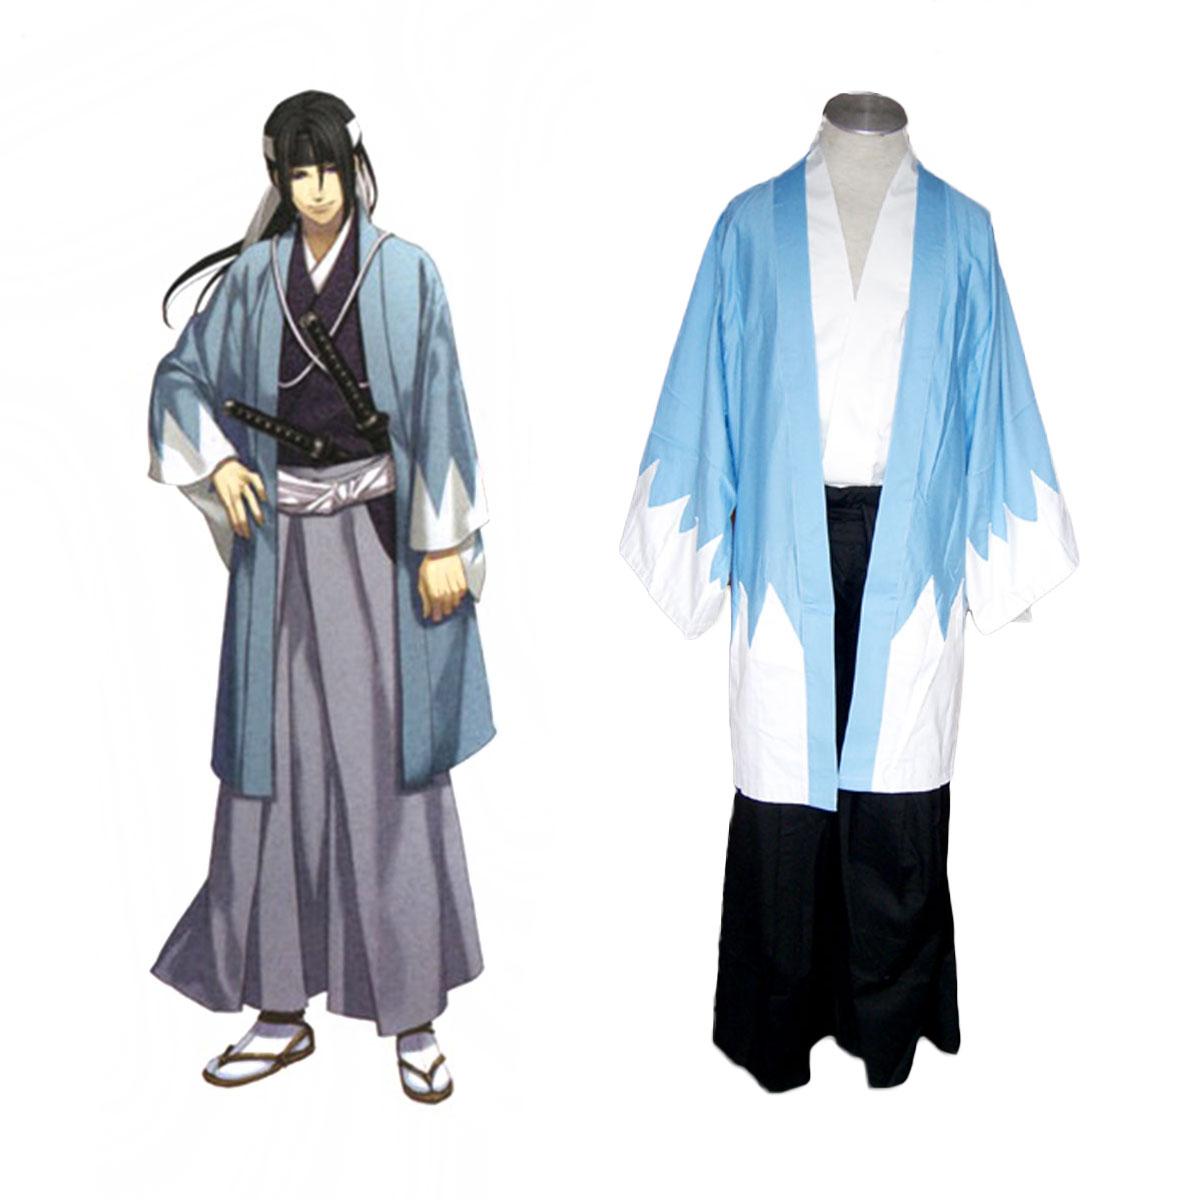 Fantasias Peacemaker Kurogane Okita Souji Azul Swordsman Cosplay Costume